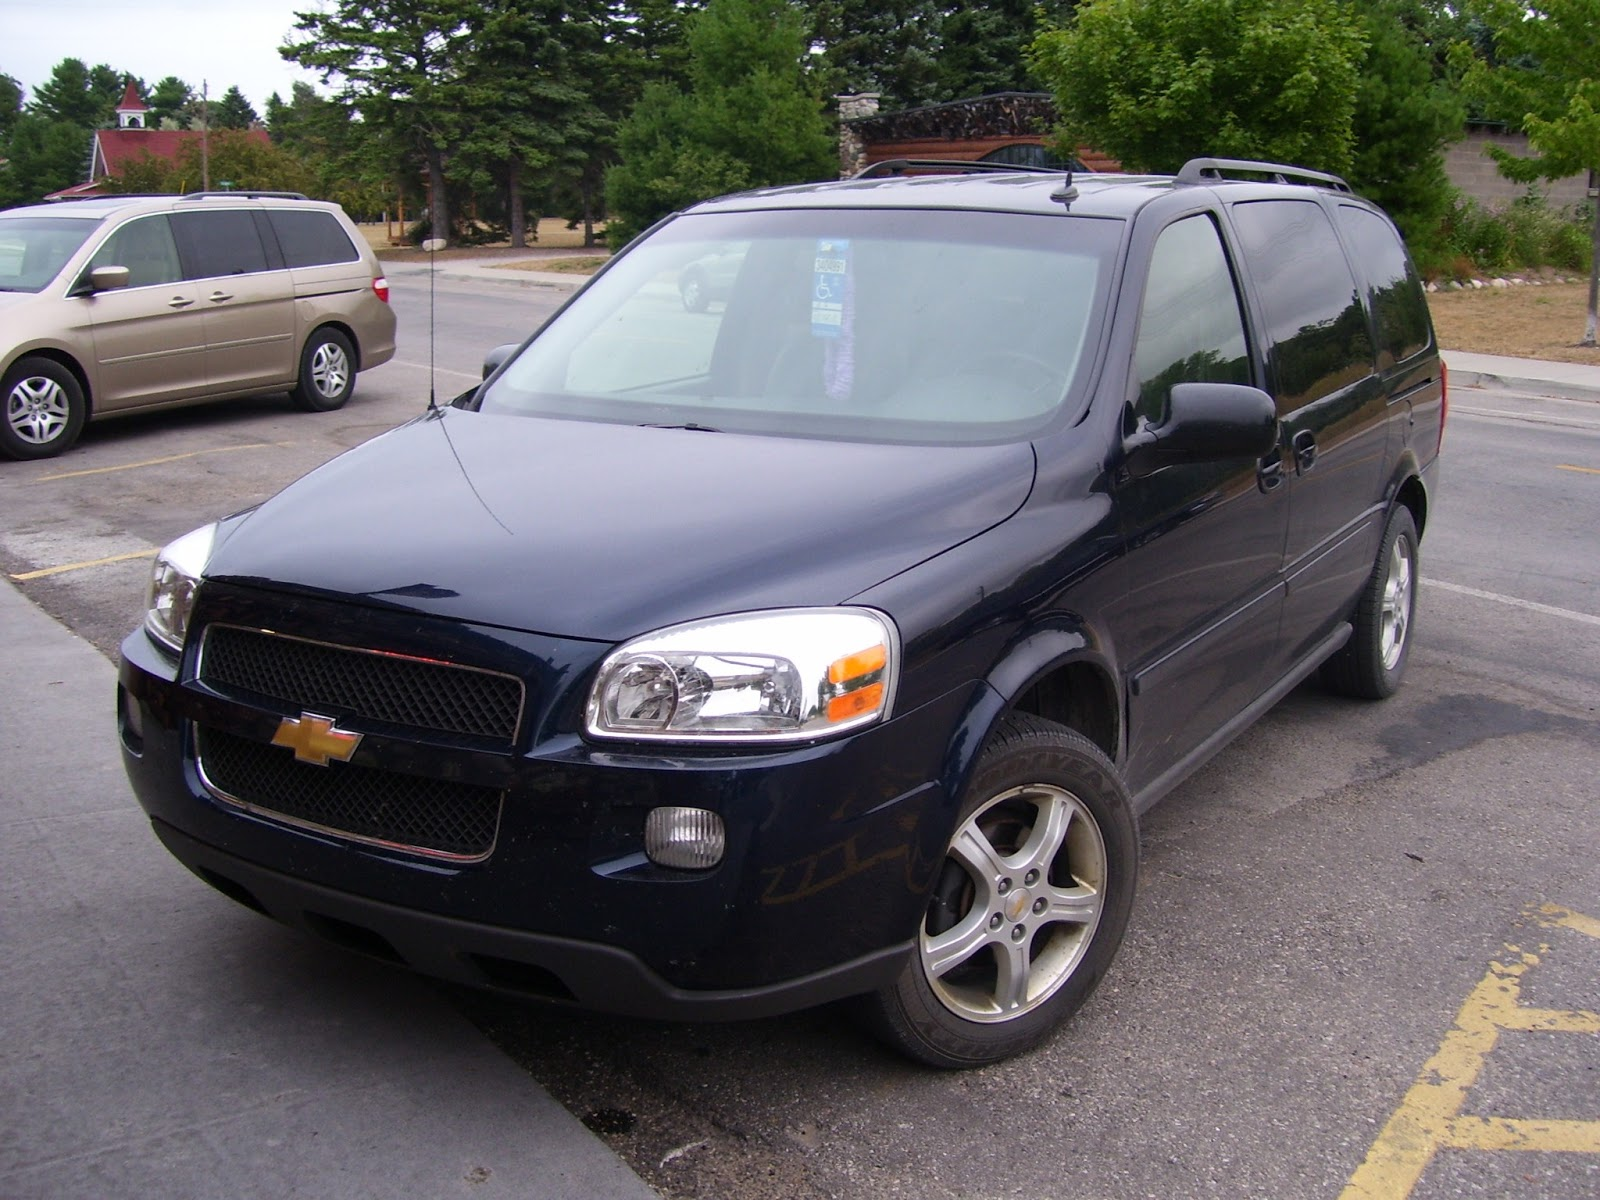 Chevrolet Uplander - Wikipedia